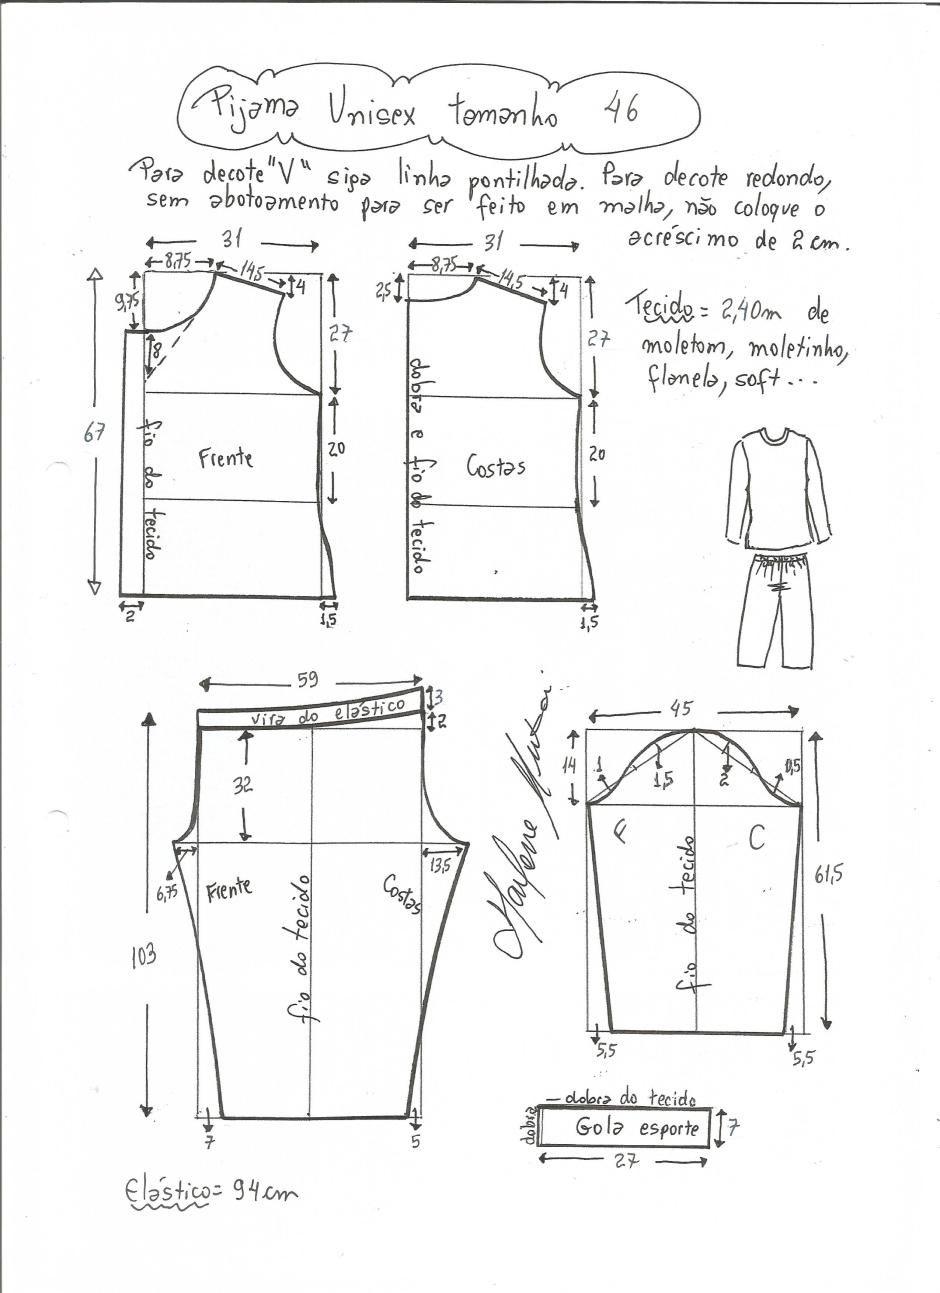 pijama-unisex-46 | Uniformes modernos | Pinterest | Hacer ropa ...